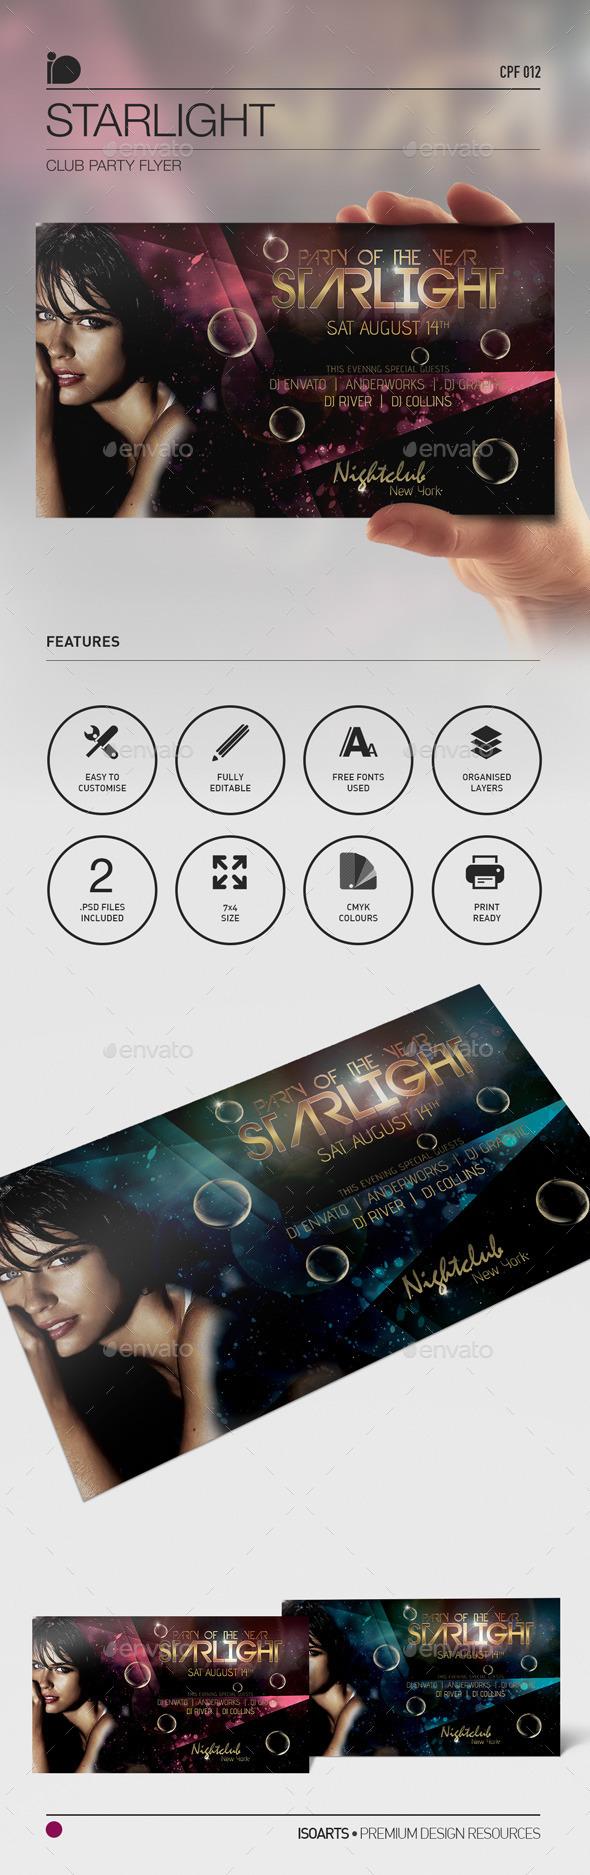 Club Celebration Flyer • Starlight – Download